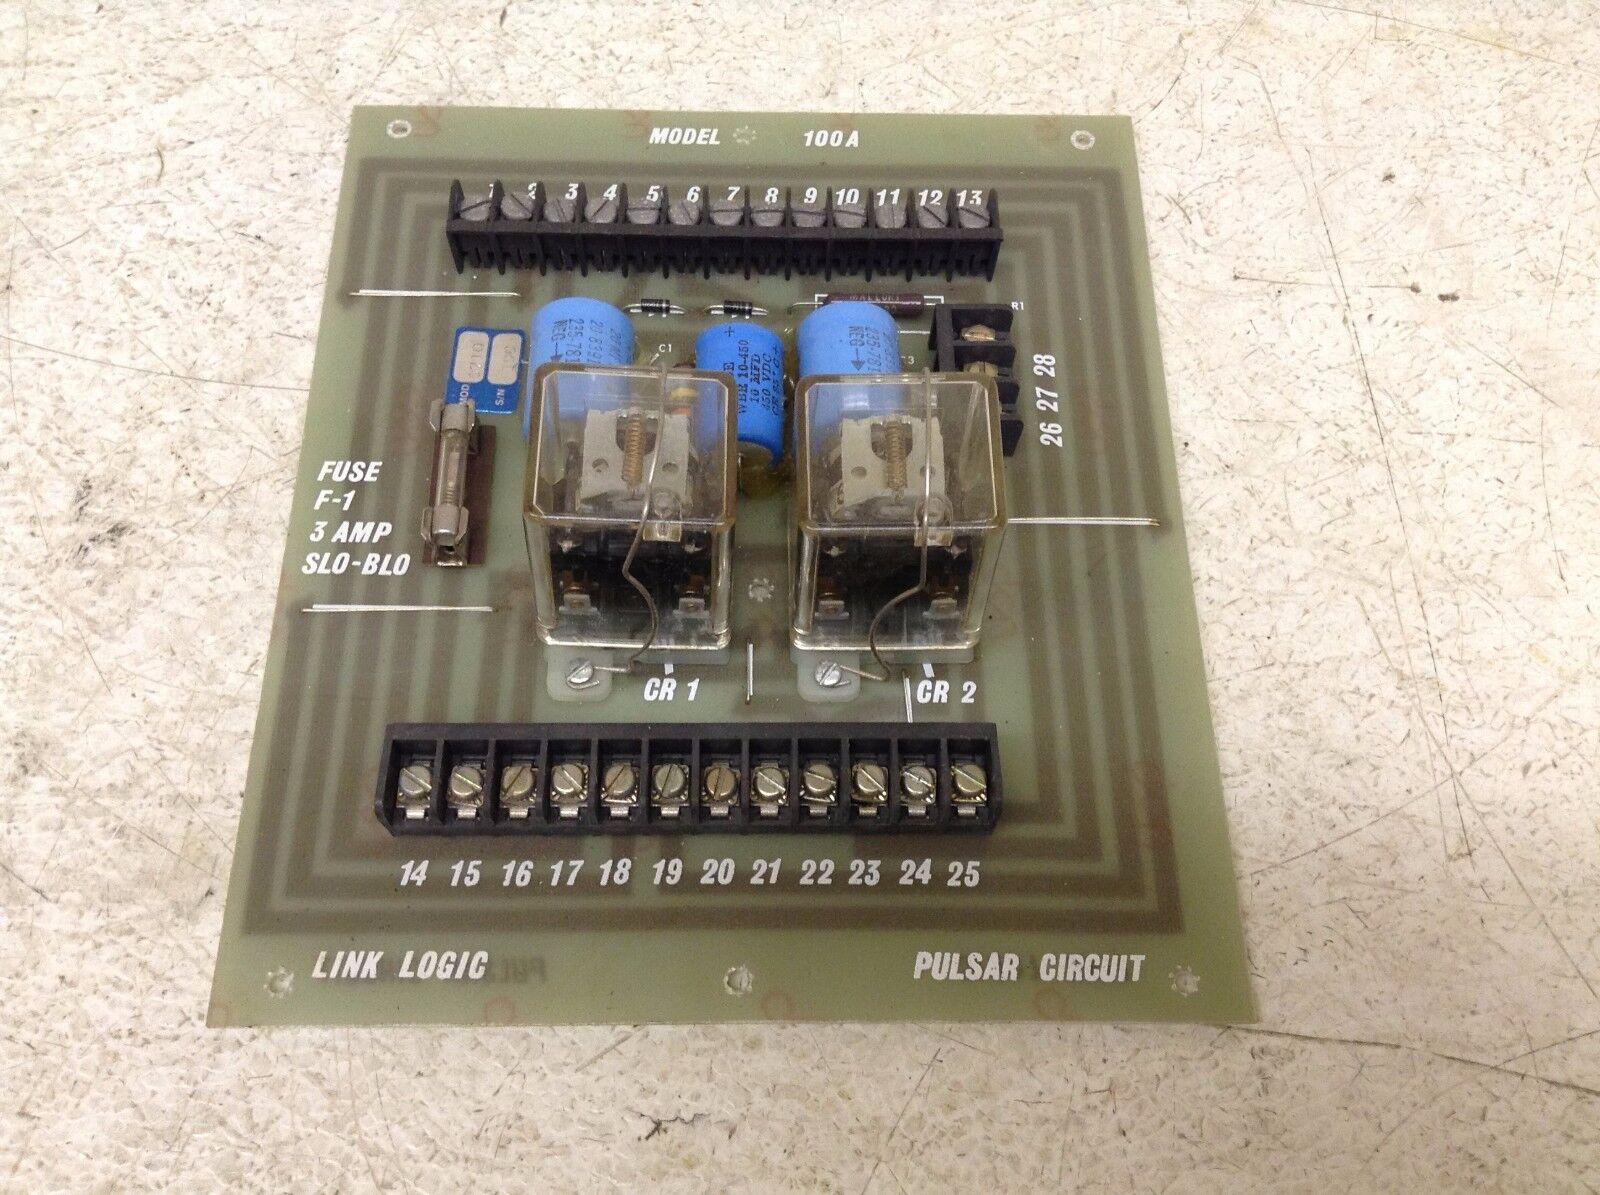 Link Logic 100A Pulsar Circuit PCB Circuit Board (TSC)